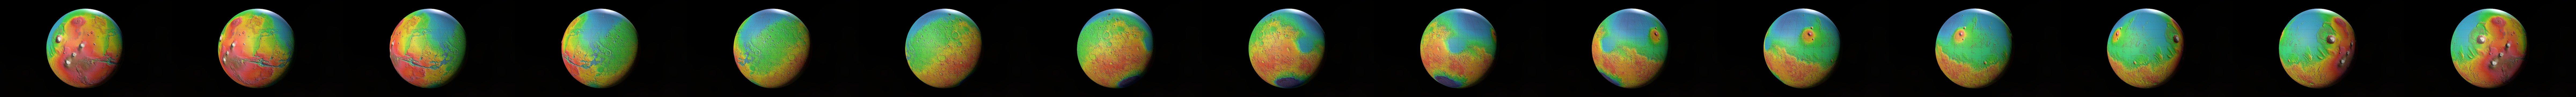 карта гугл марс google mars онлайн со спутника 2020